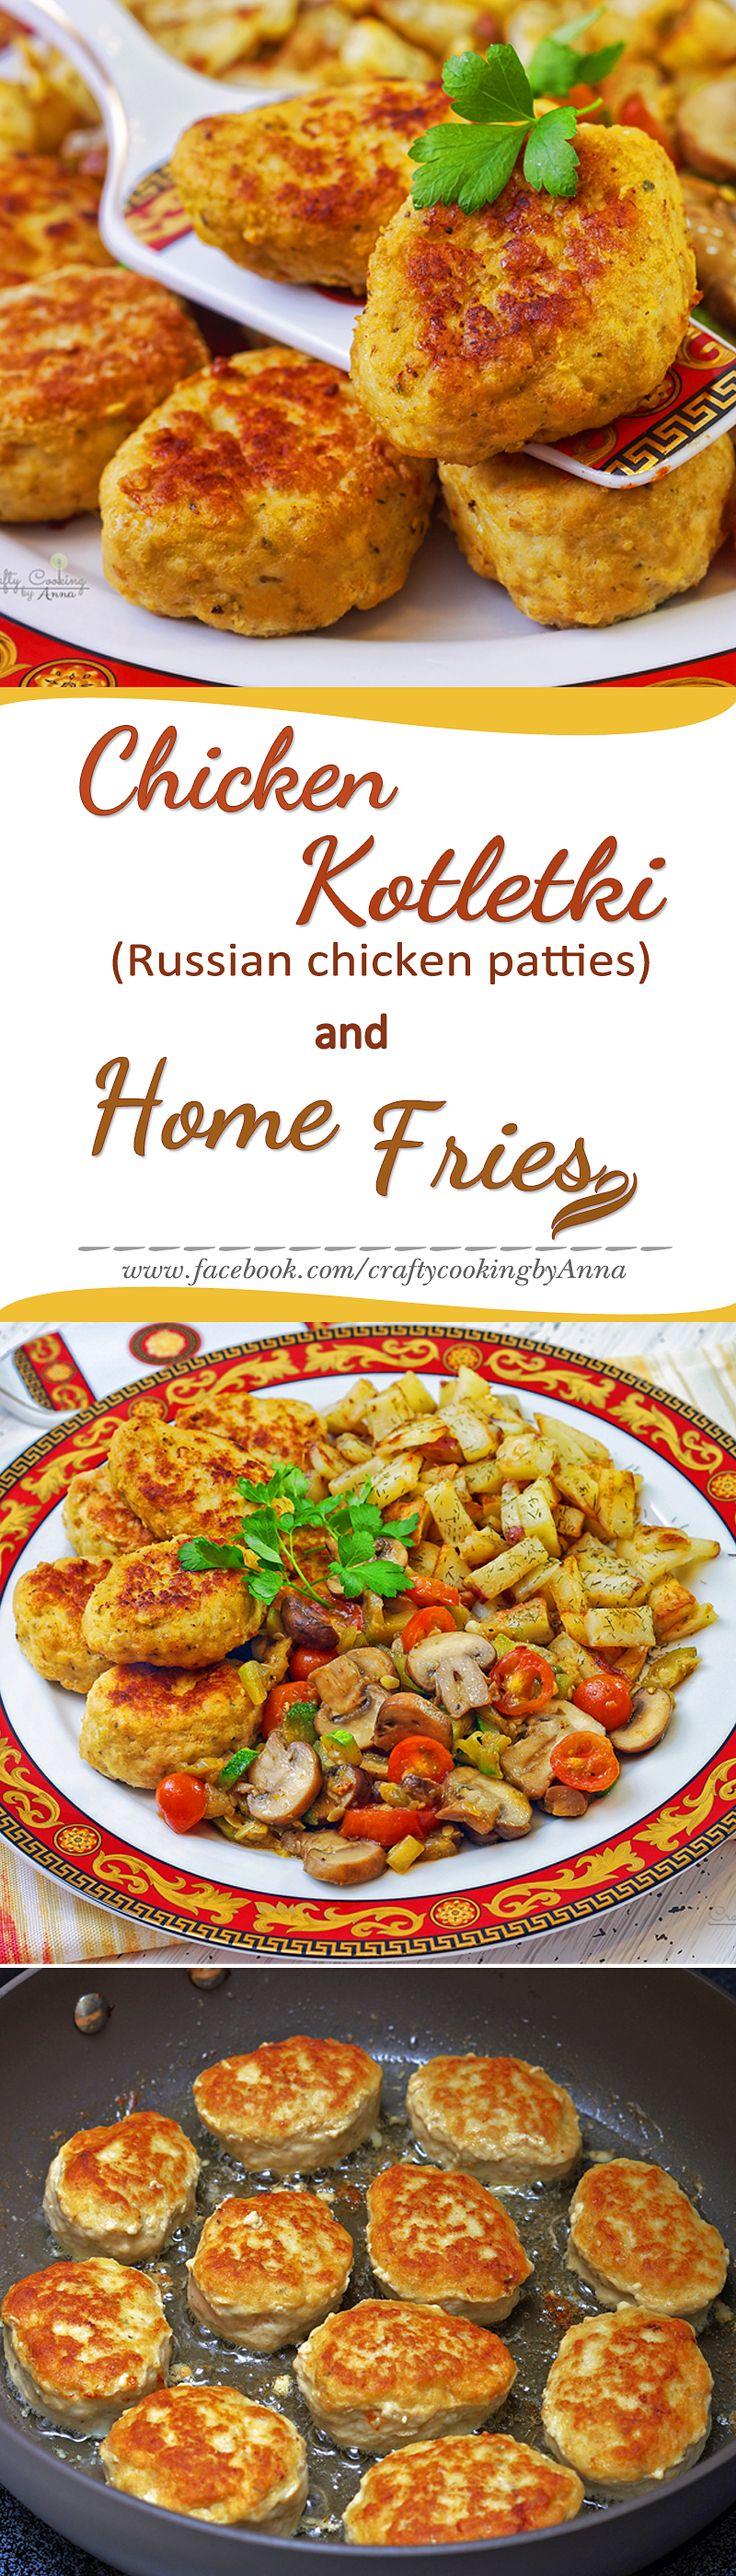 Kotletki and Home Fries